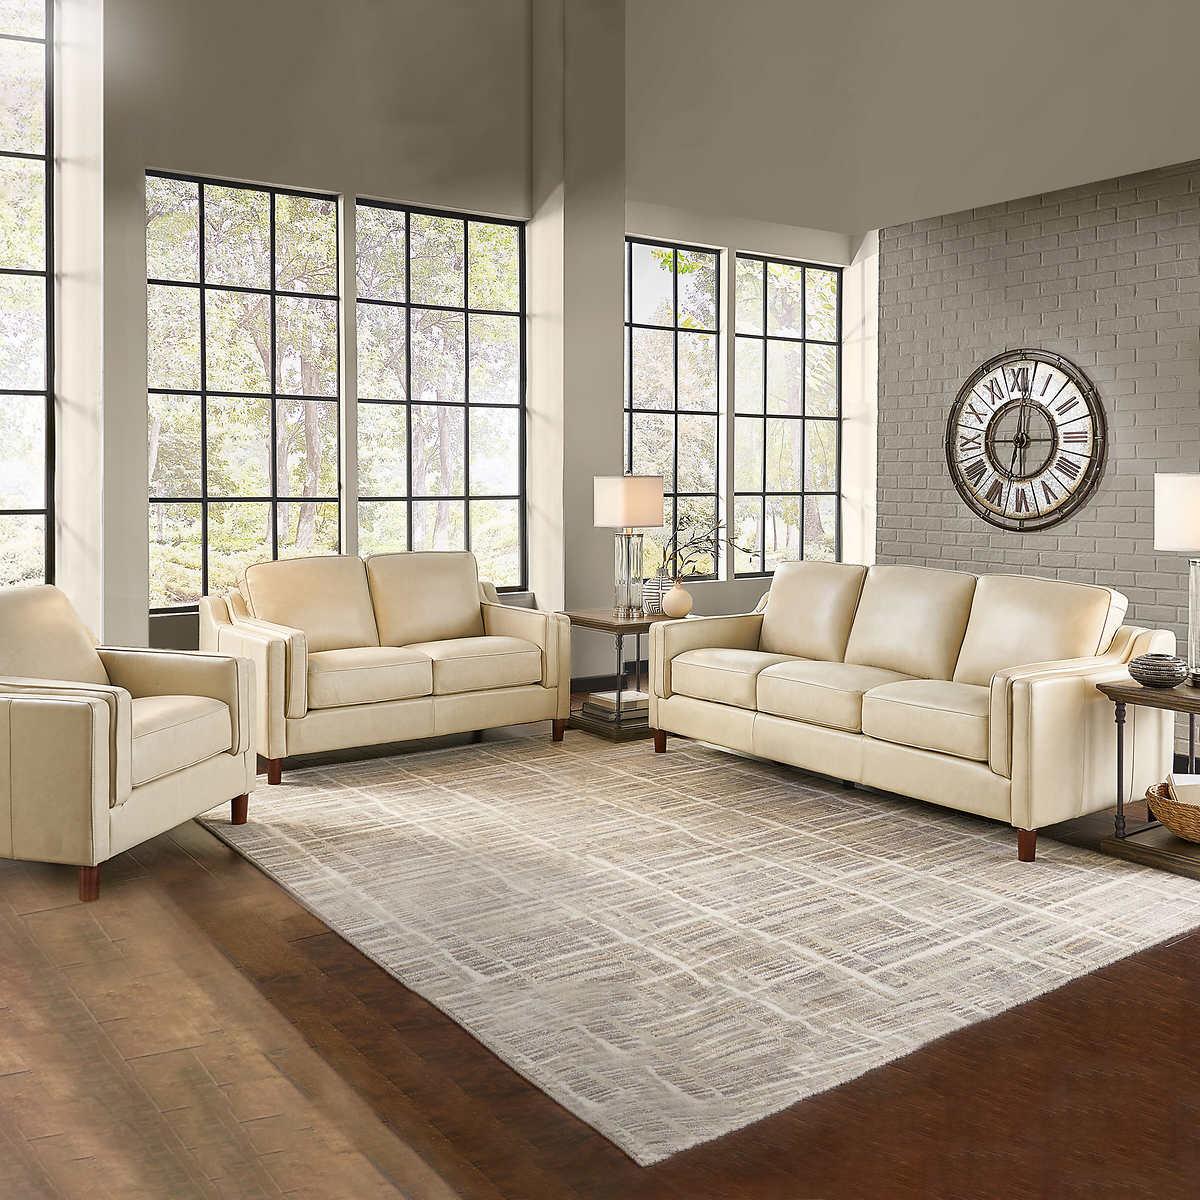 Prospera Home Dobson Modern Top Grain Leather 3 Piece Living Room Set